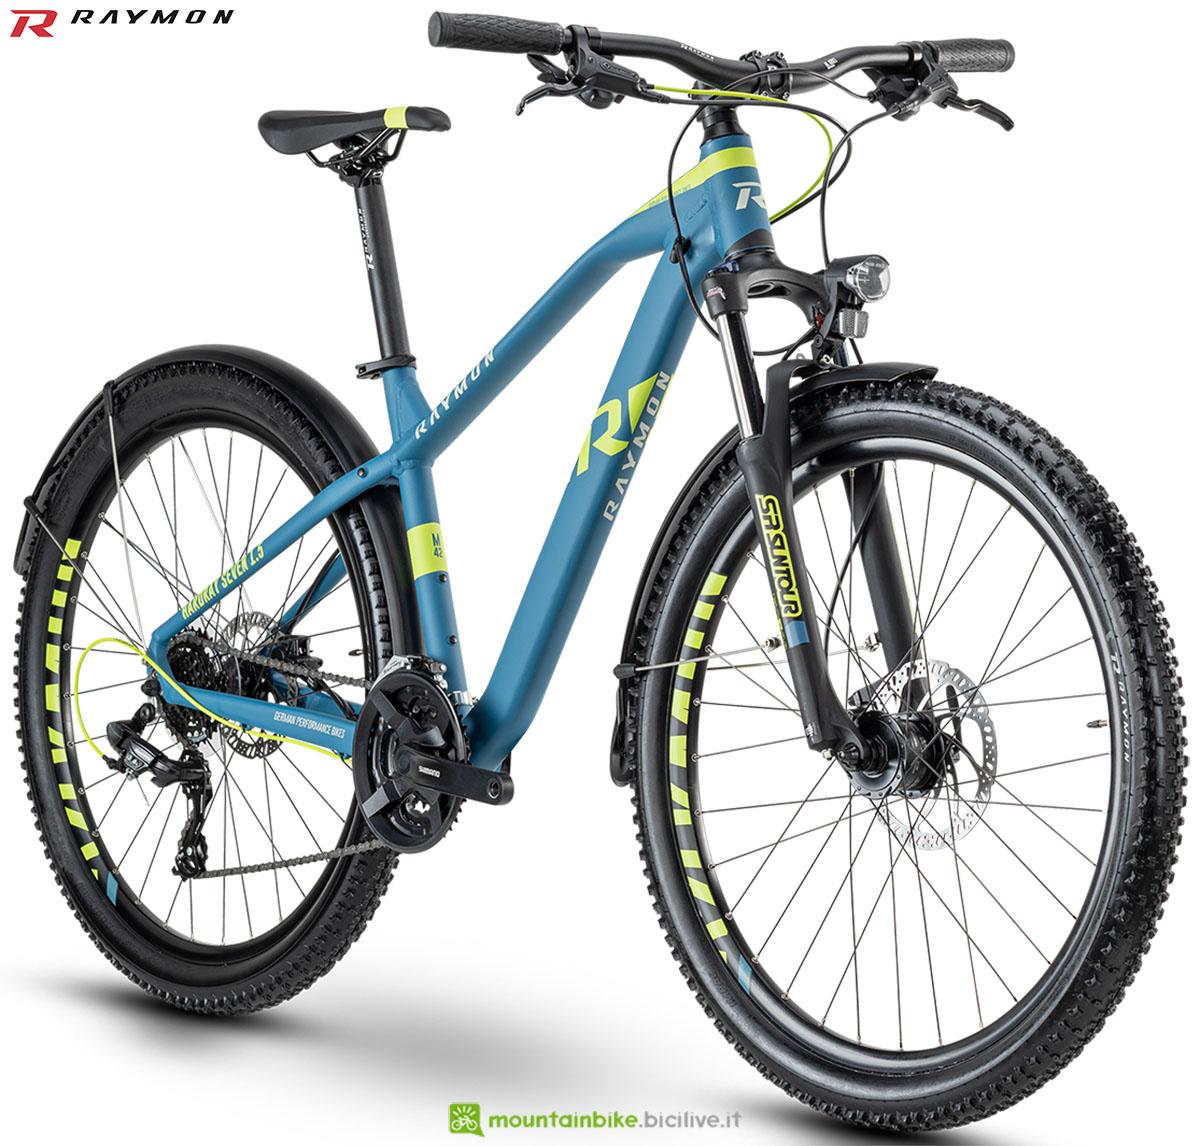 Una bici mtb R Raymon Hardray Seven/Nine 1.5 Street 2020